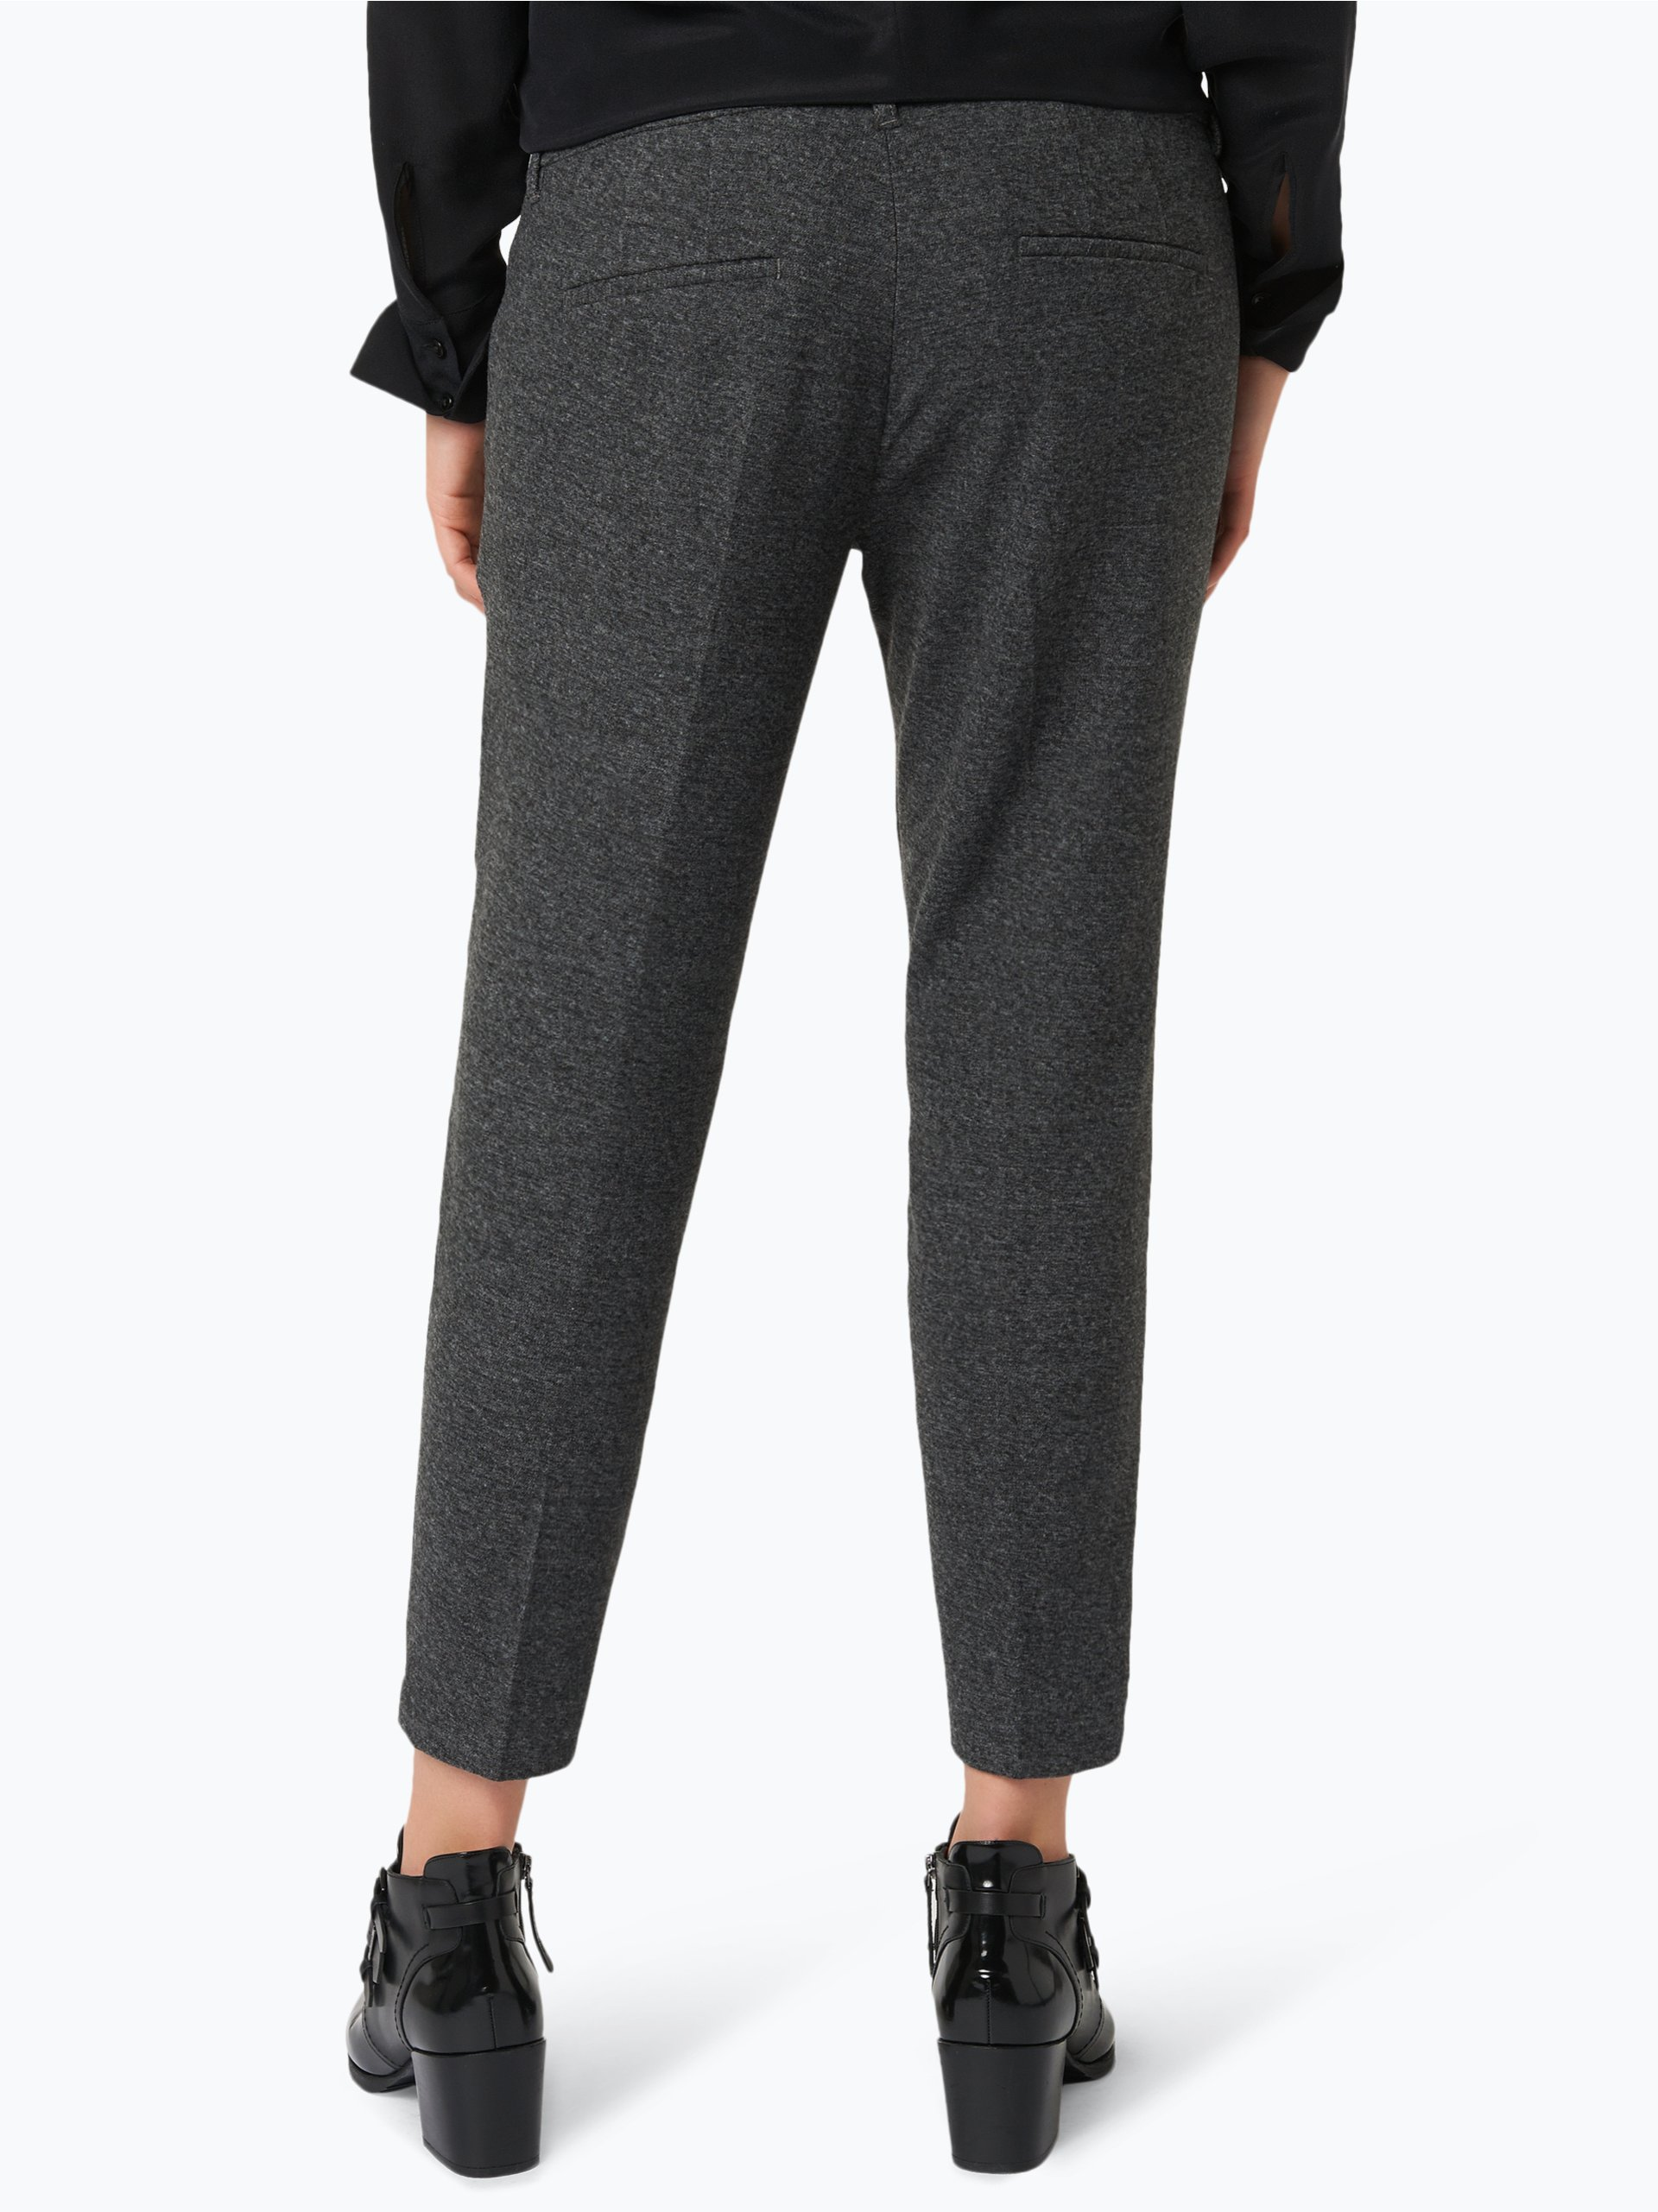 Review Hosen Damen. review damen hose grau uni online kaufen